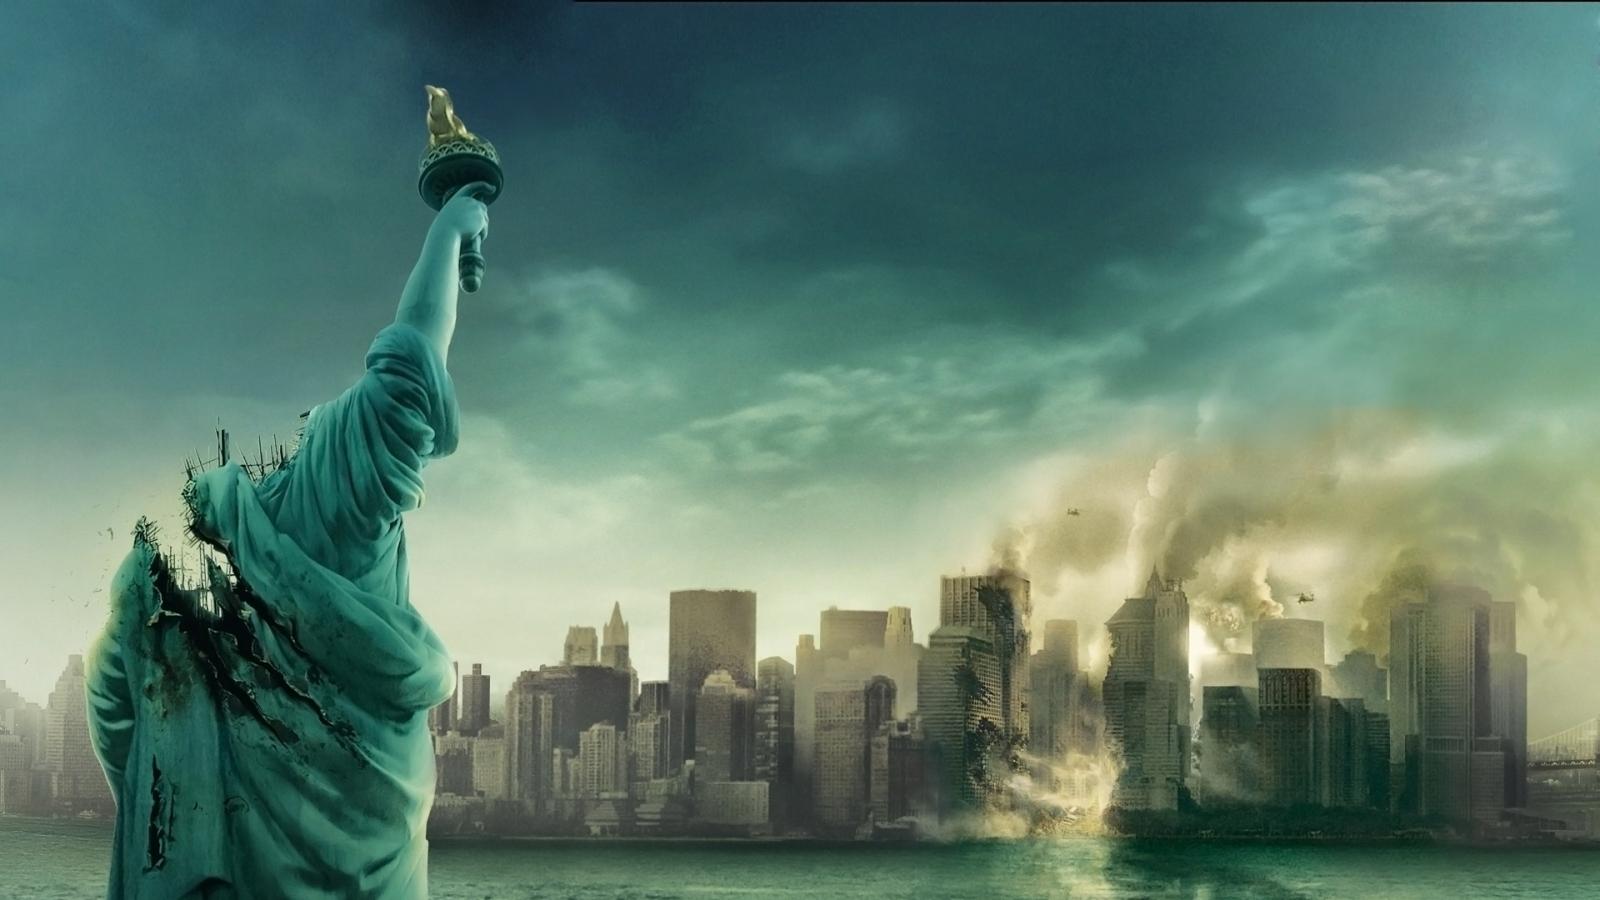 Netflix might acquire Cloverfield sequel God Particle